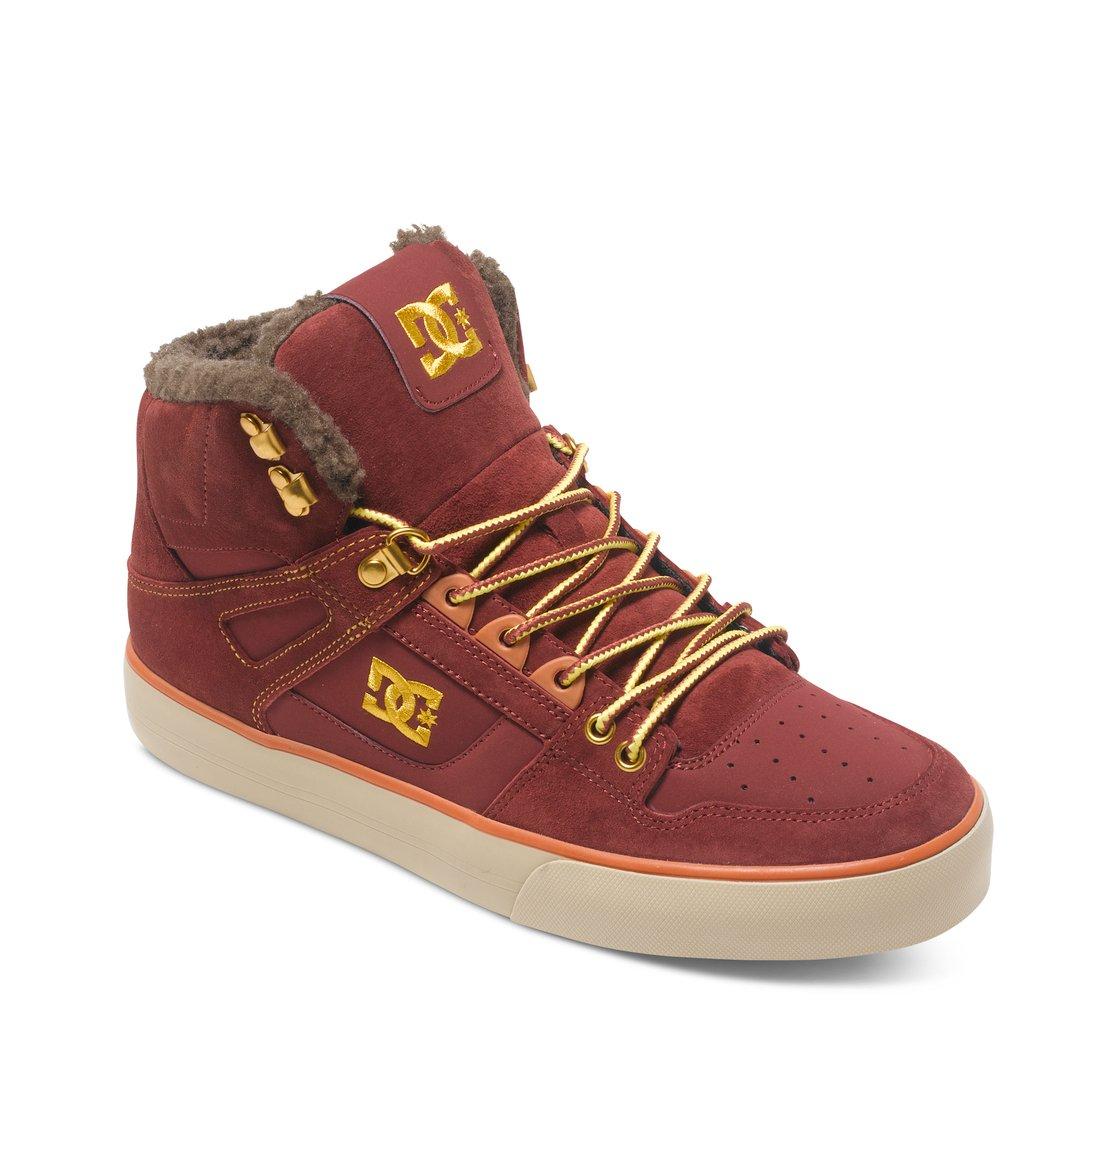 Dc Men S Spartan Hi Wc Skate Shoes Brown Size